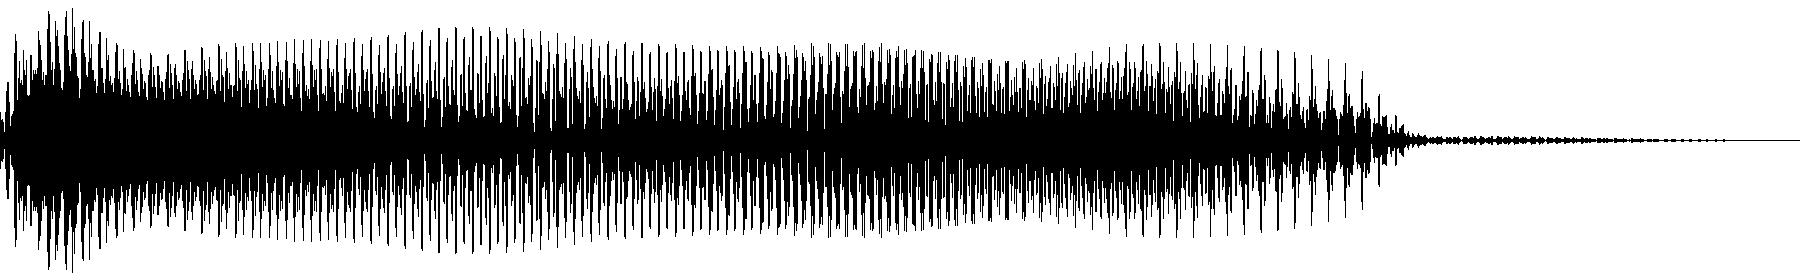 vedh synth cut 005 f